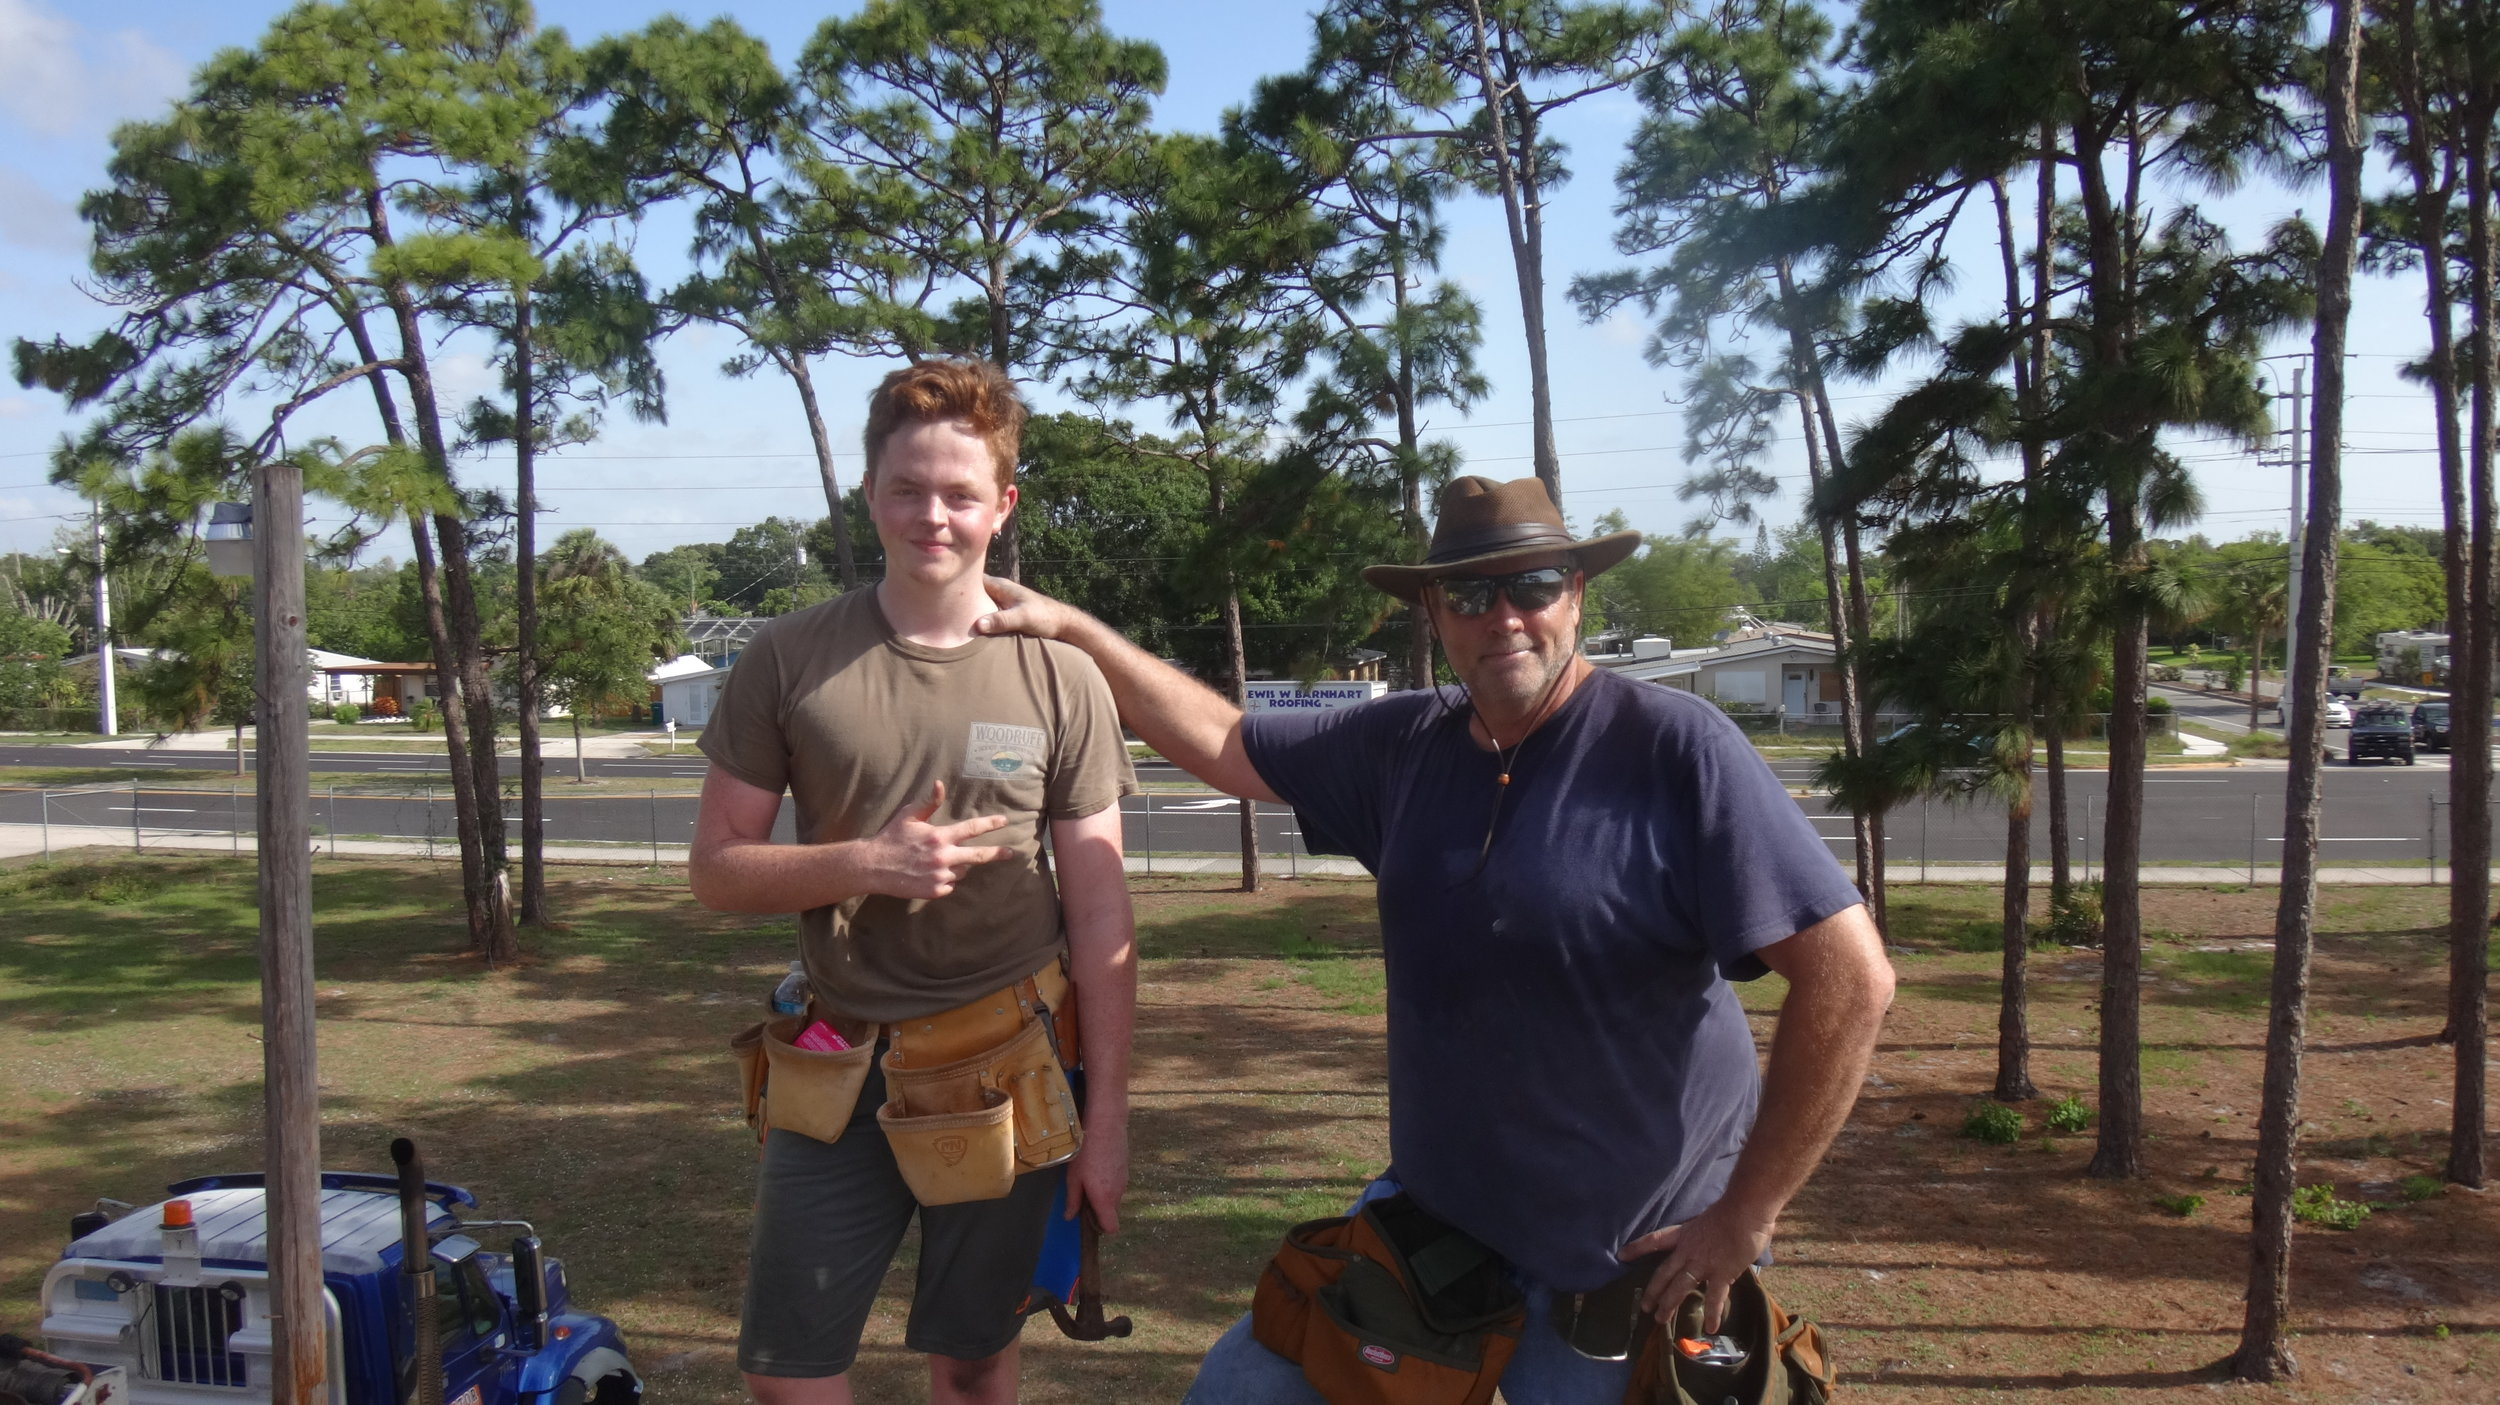 Dan Walton and his son, Matthew on the job